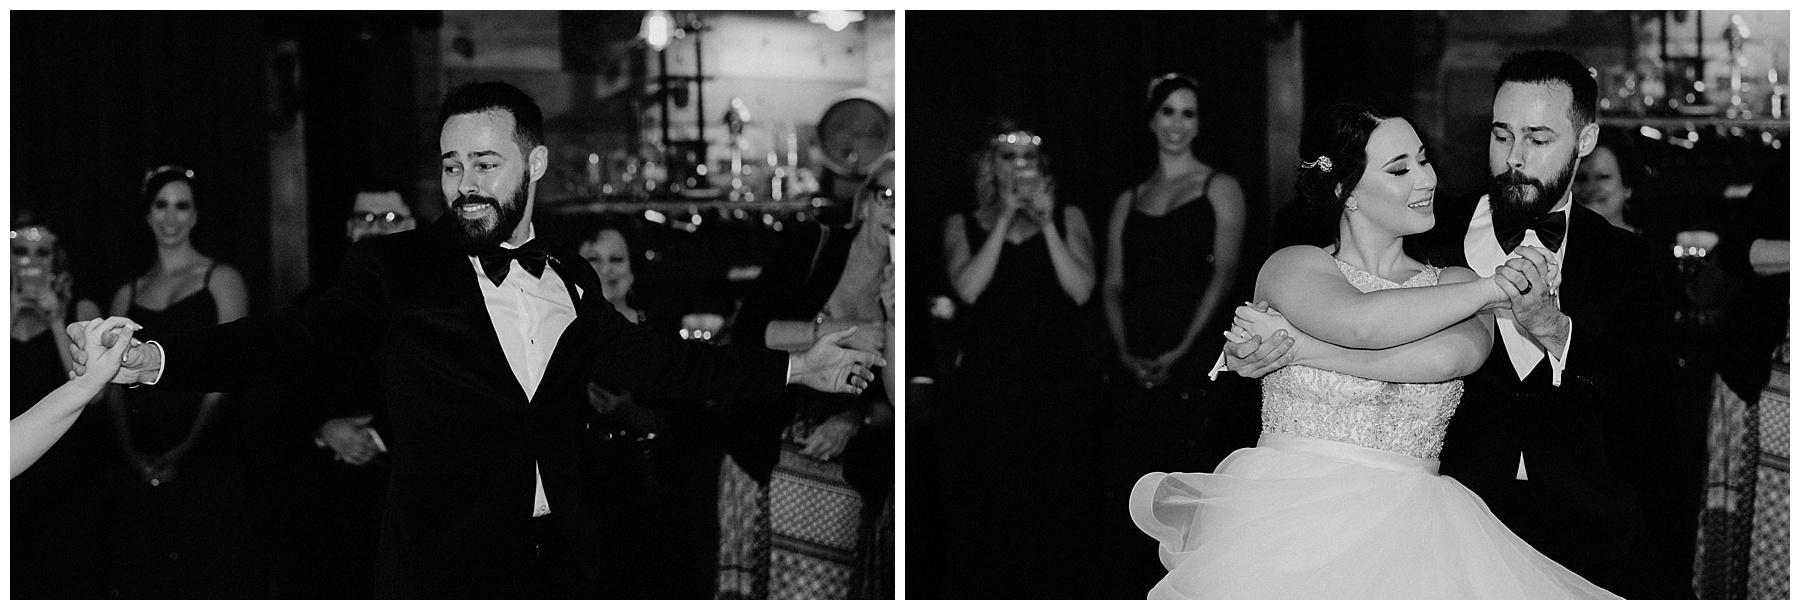 Fort Lauderdale Wedding Tampa Wedding Photographer-138.jpg